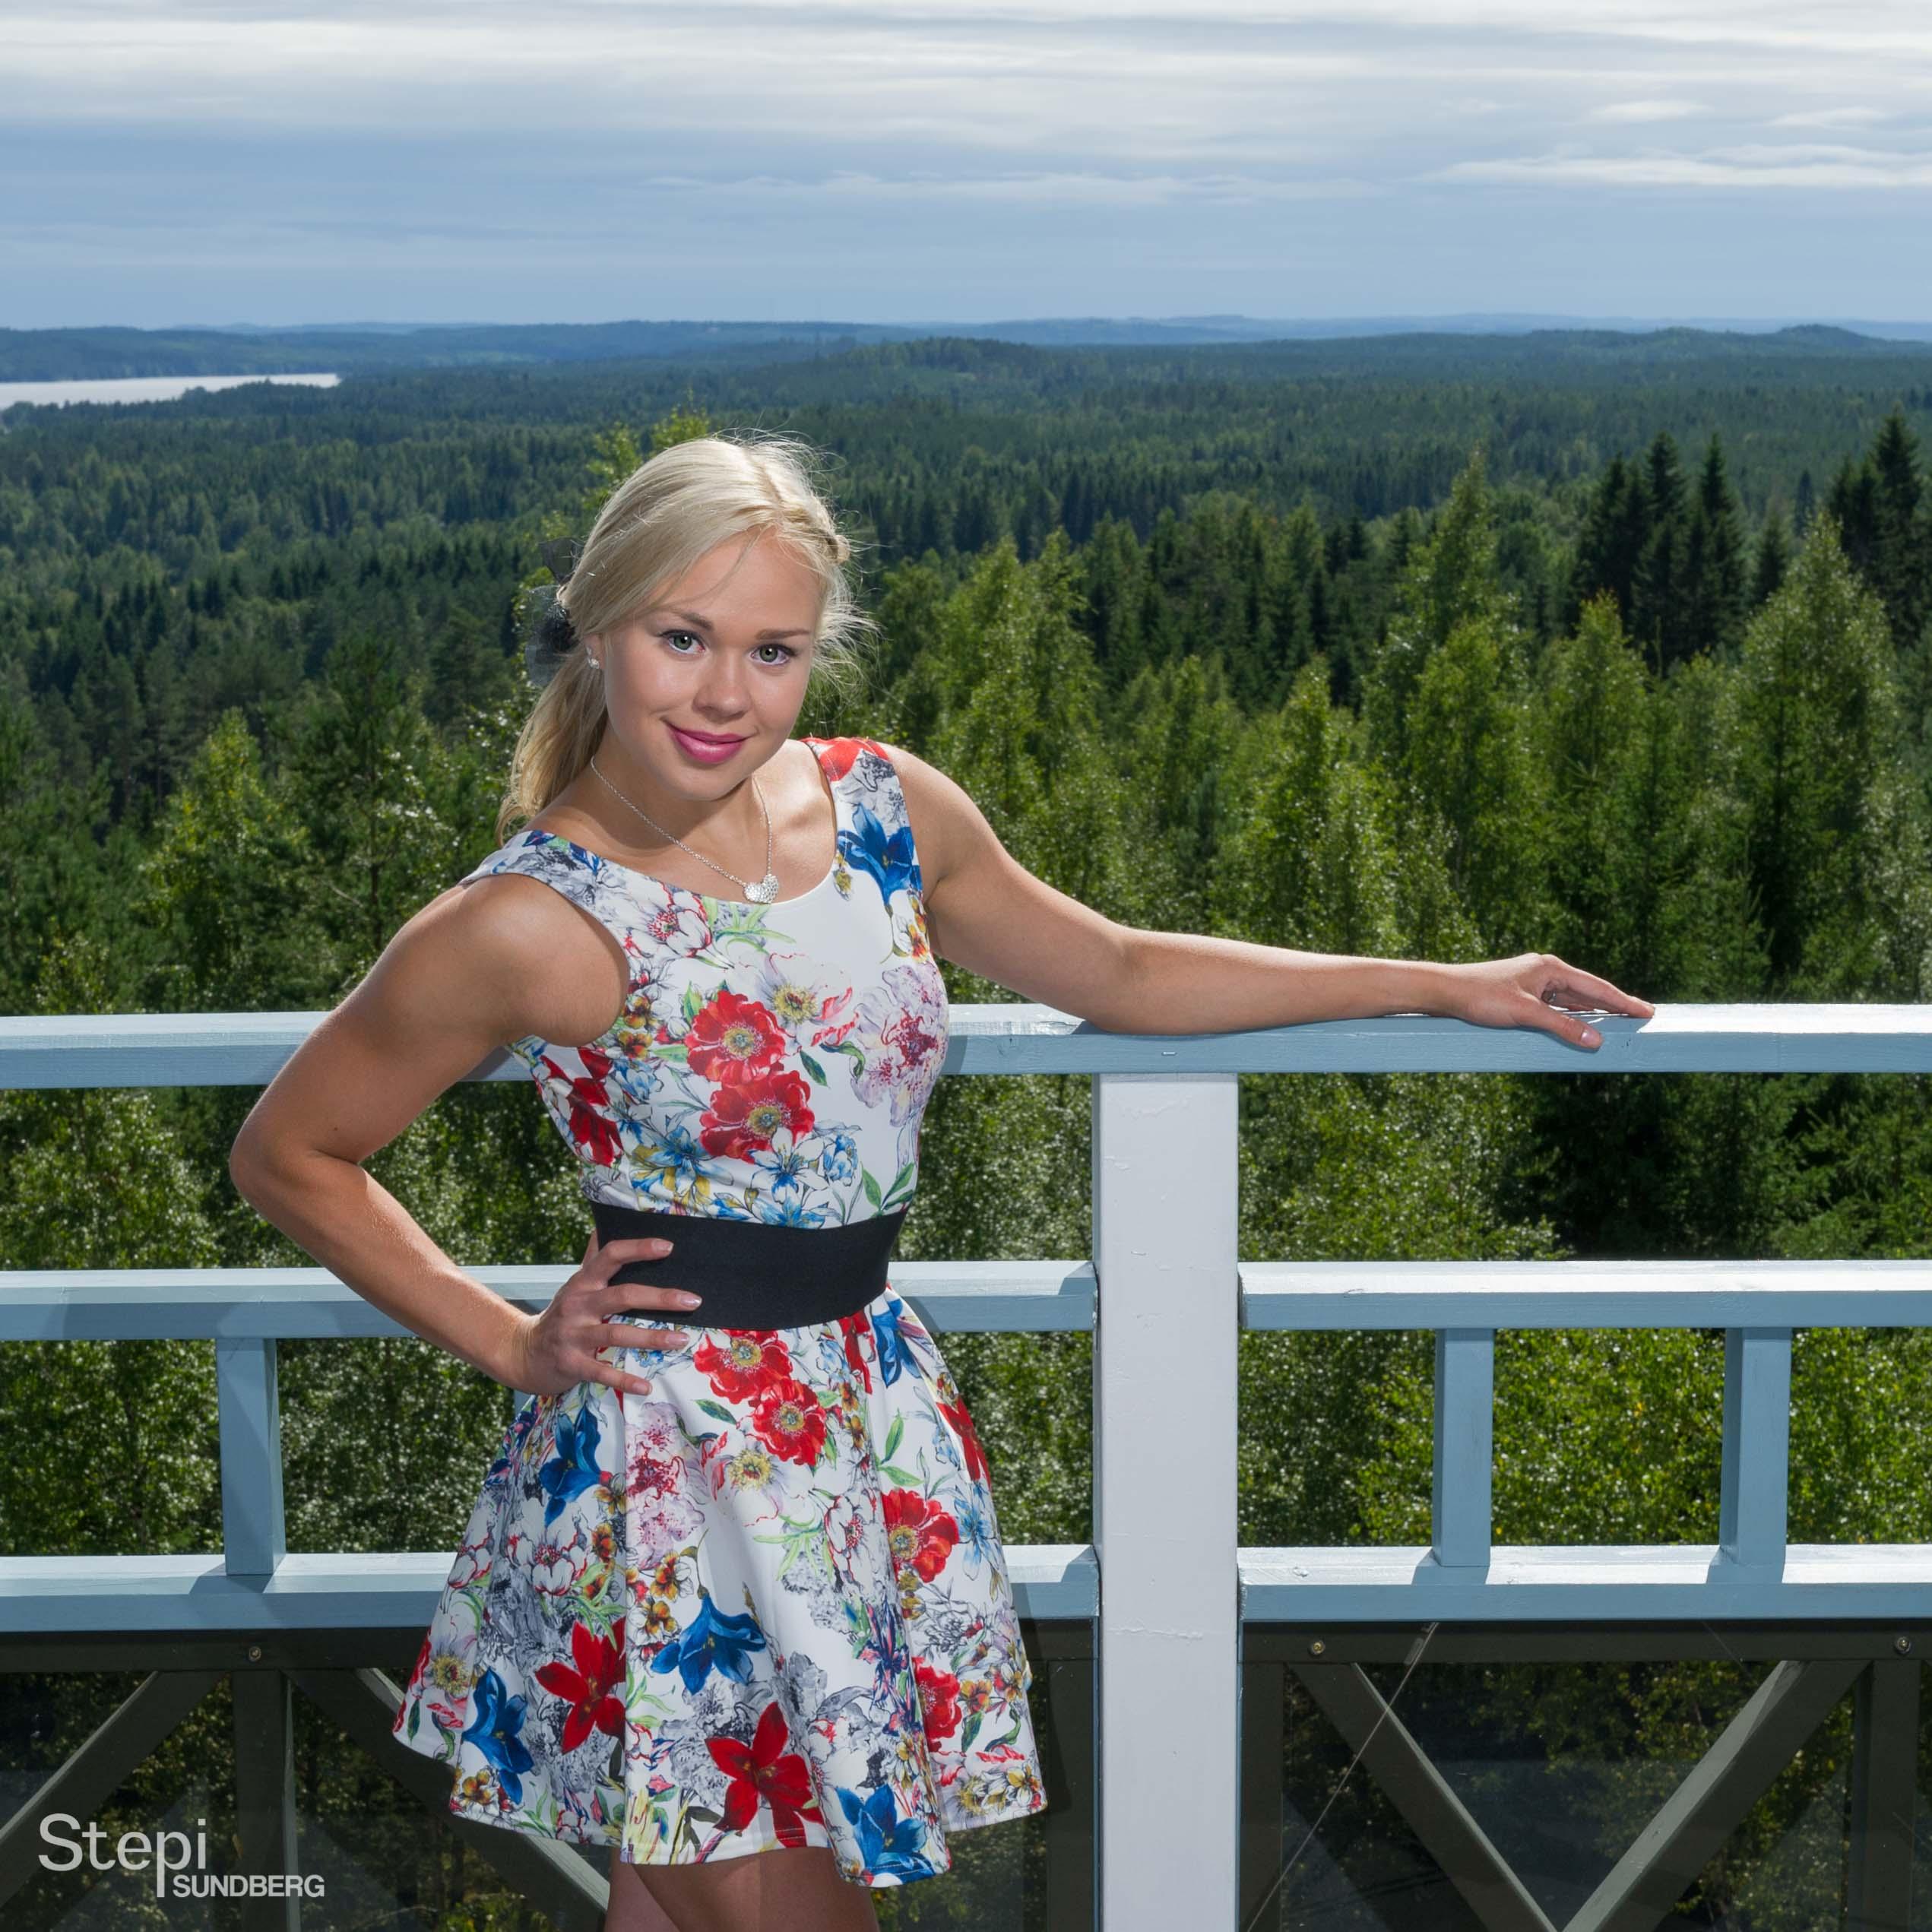 Mallikuva miljöössä, Valokuvaaja Stepi Sundberg